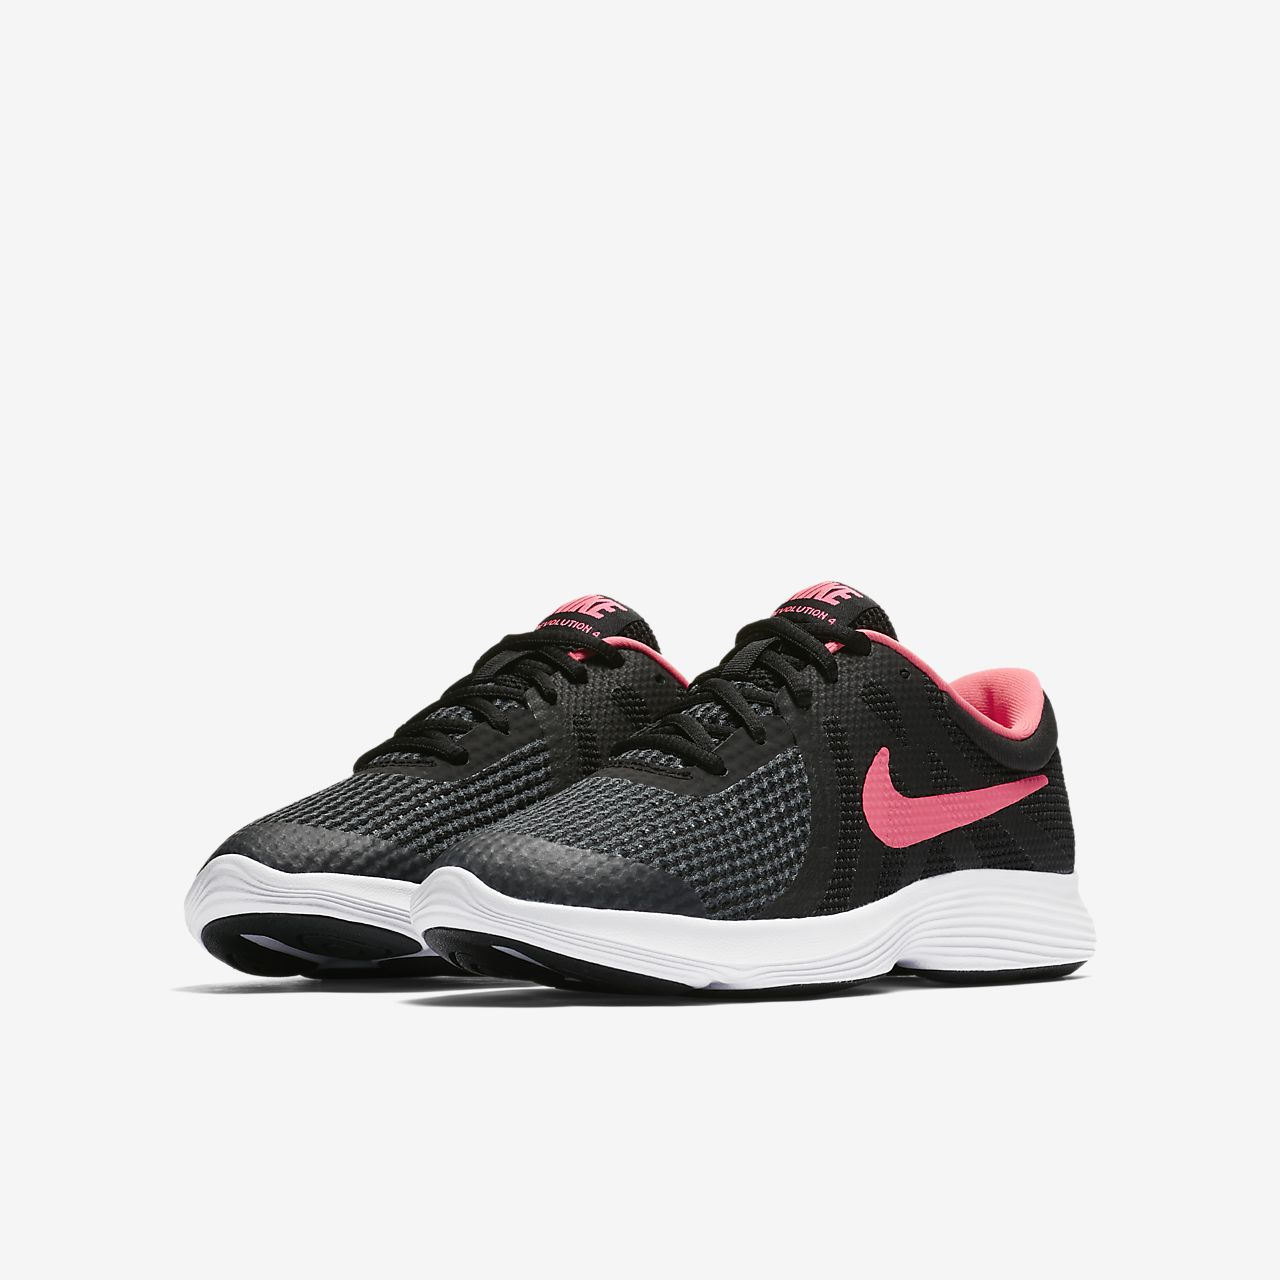 finest selection 35dd3 a1a92 Nike Revolution 4 Older Kids' Running Shoe. Nike.com GB